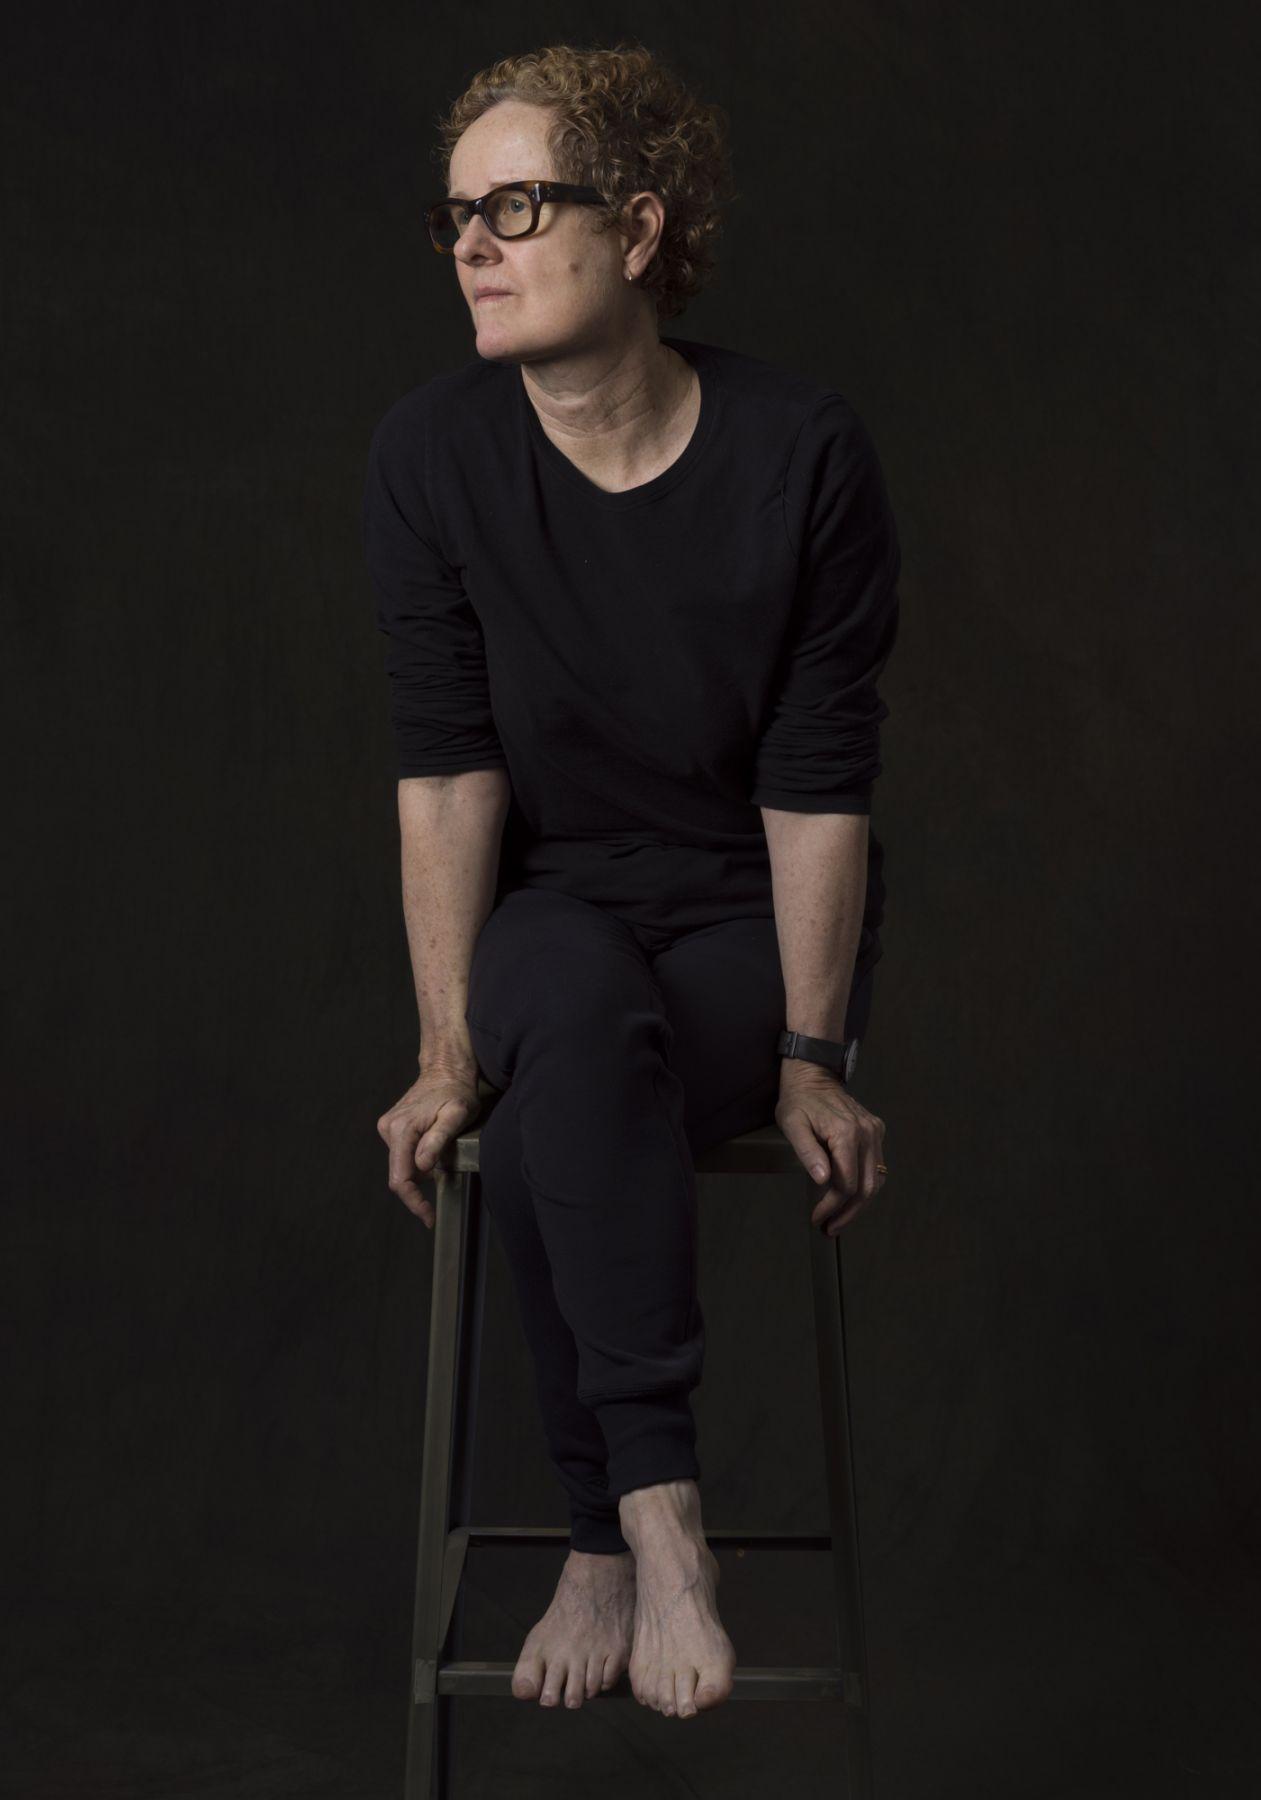 Margaret_artist-arts advocate